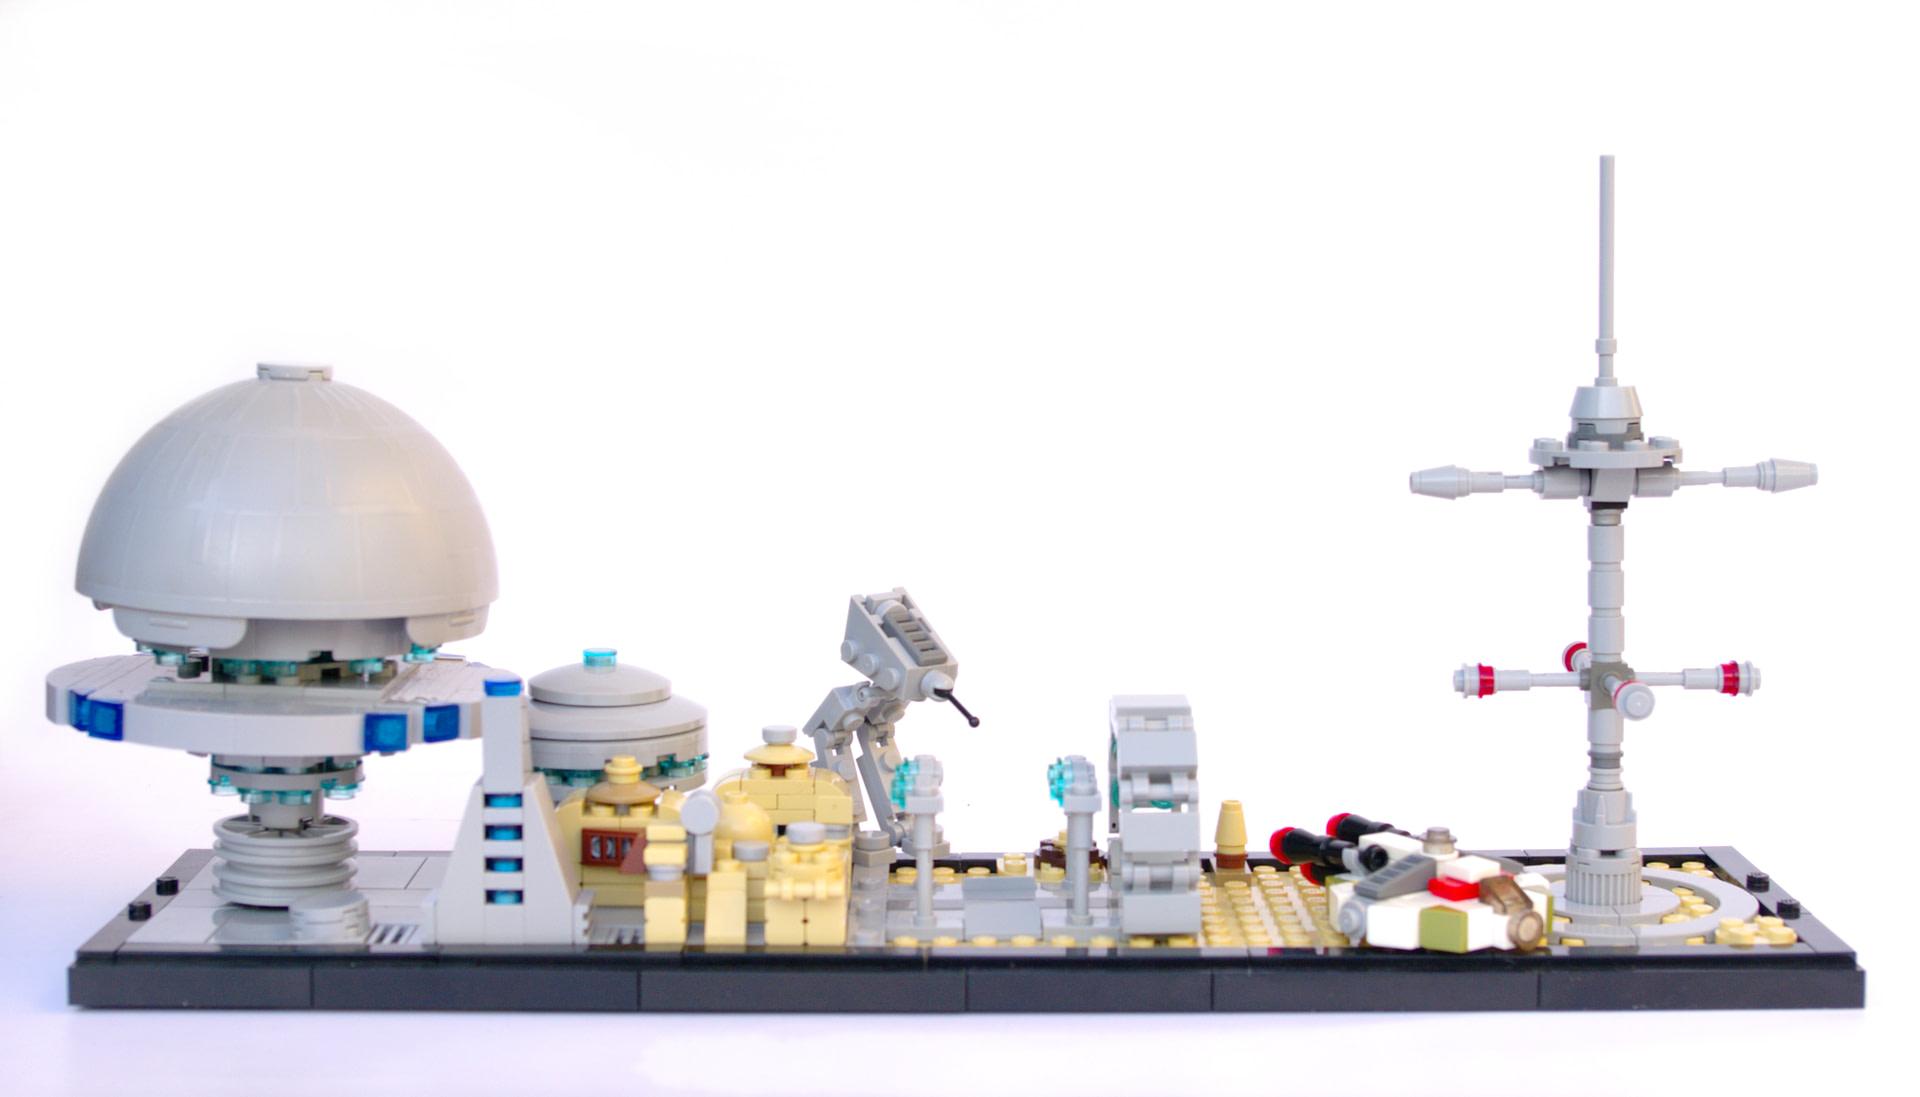 Concurs Microscale Future City – Creatia 14: Lothal Skyline